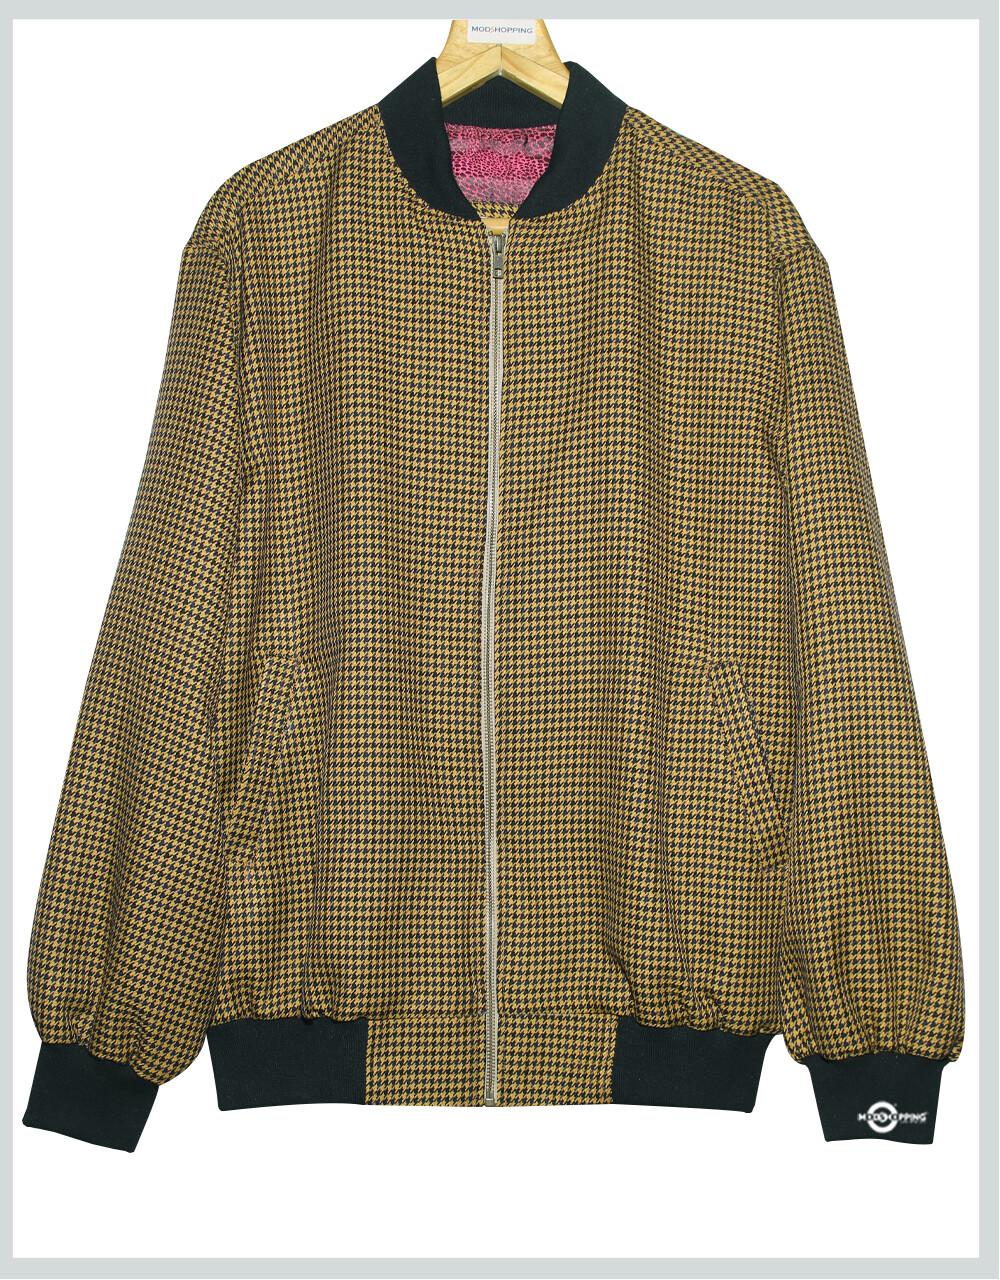 Brown & Black Hountooth Bomber Jacket